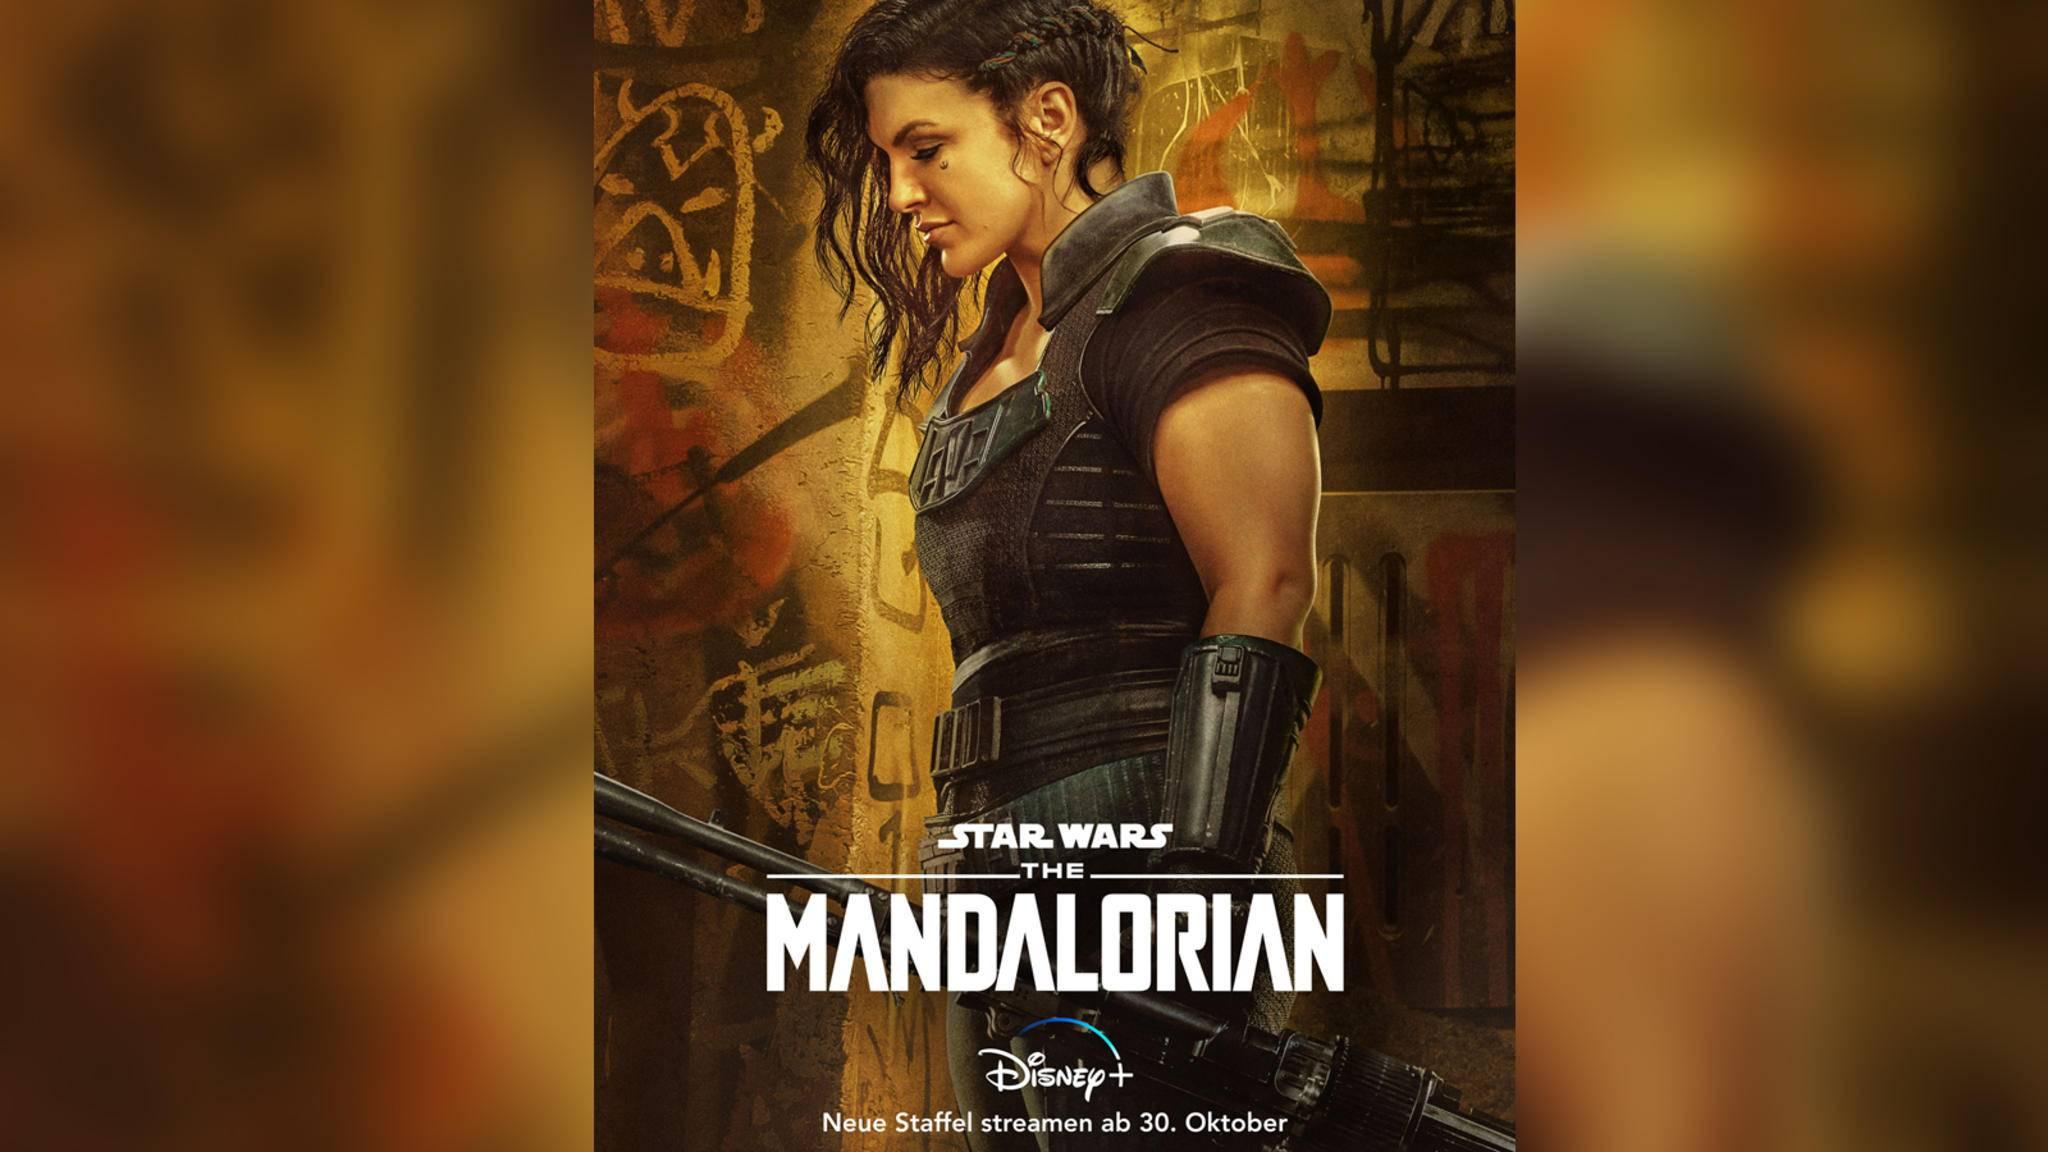 The Mandalorian S02 Cara Dune